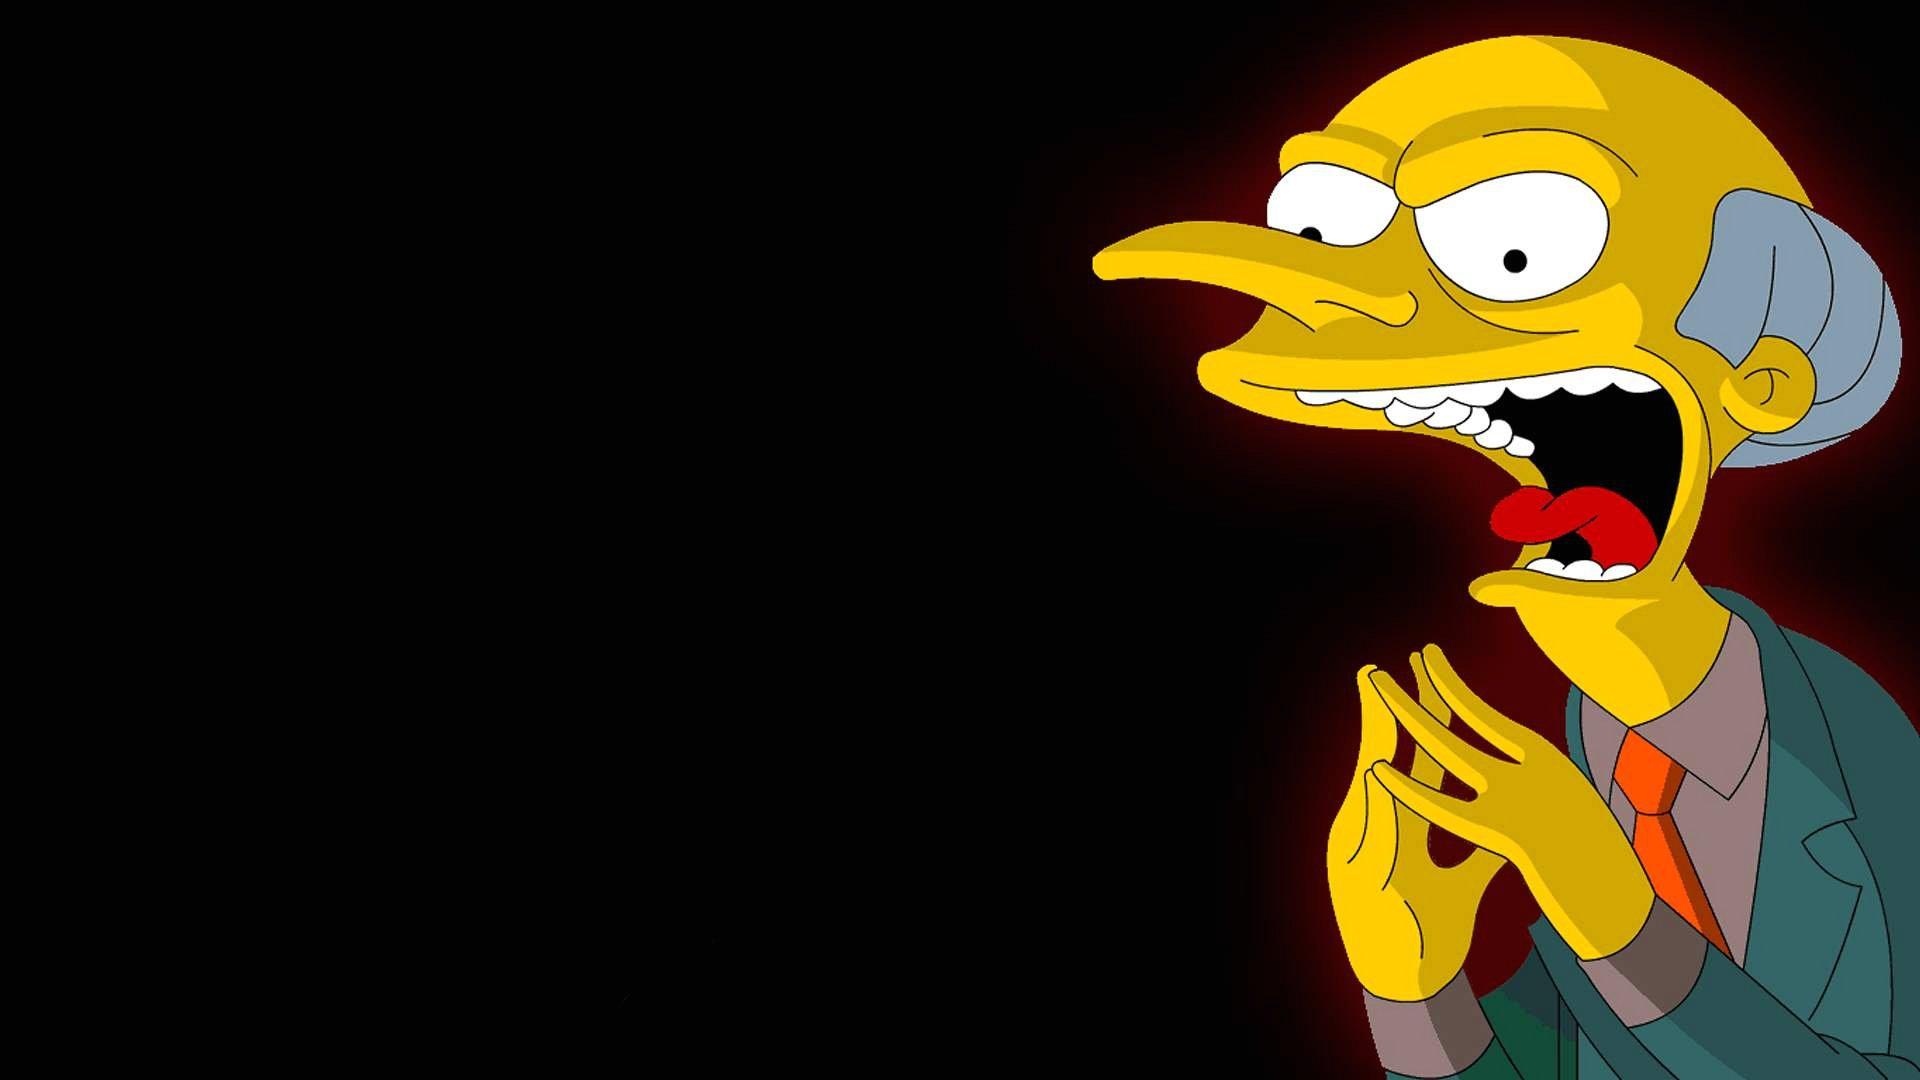 Симпсоны hd обои